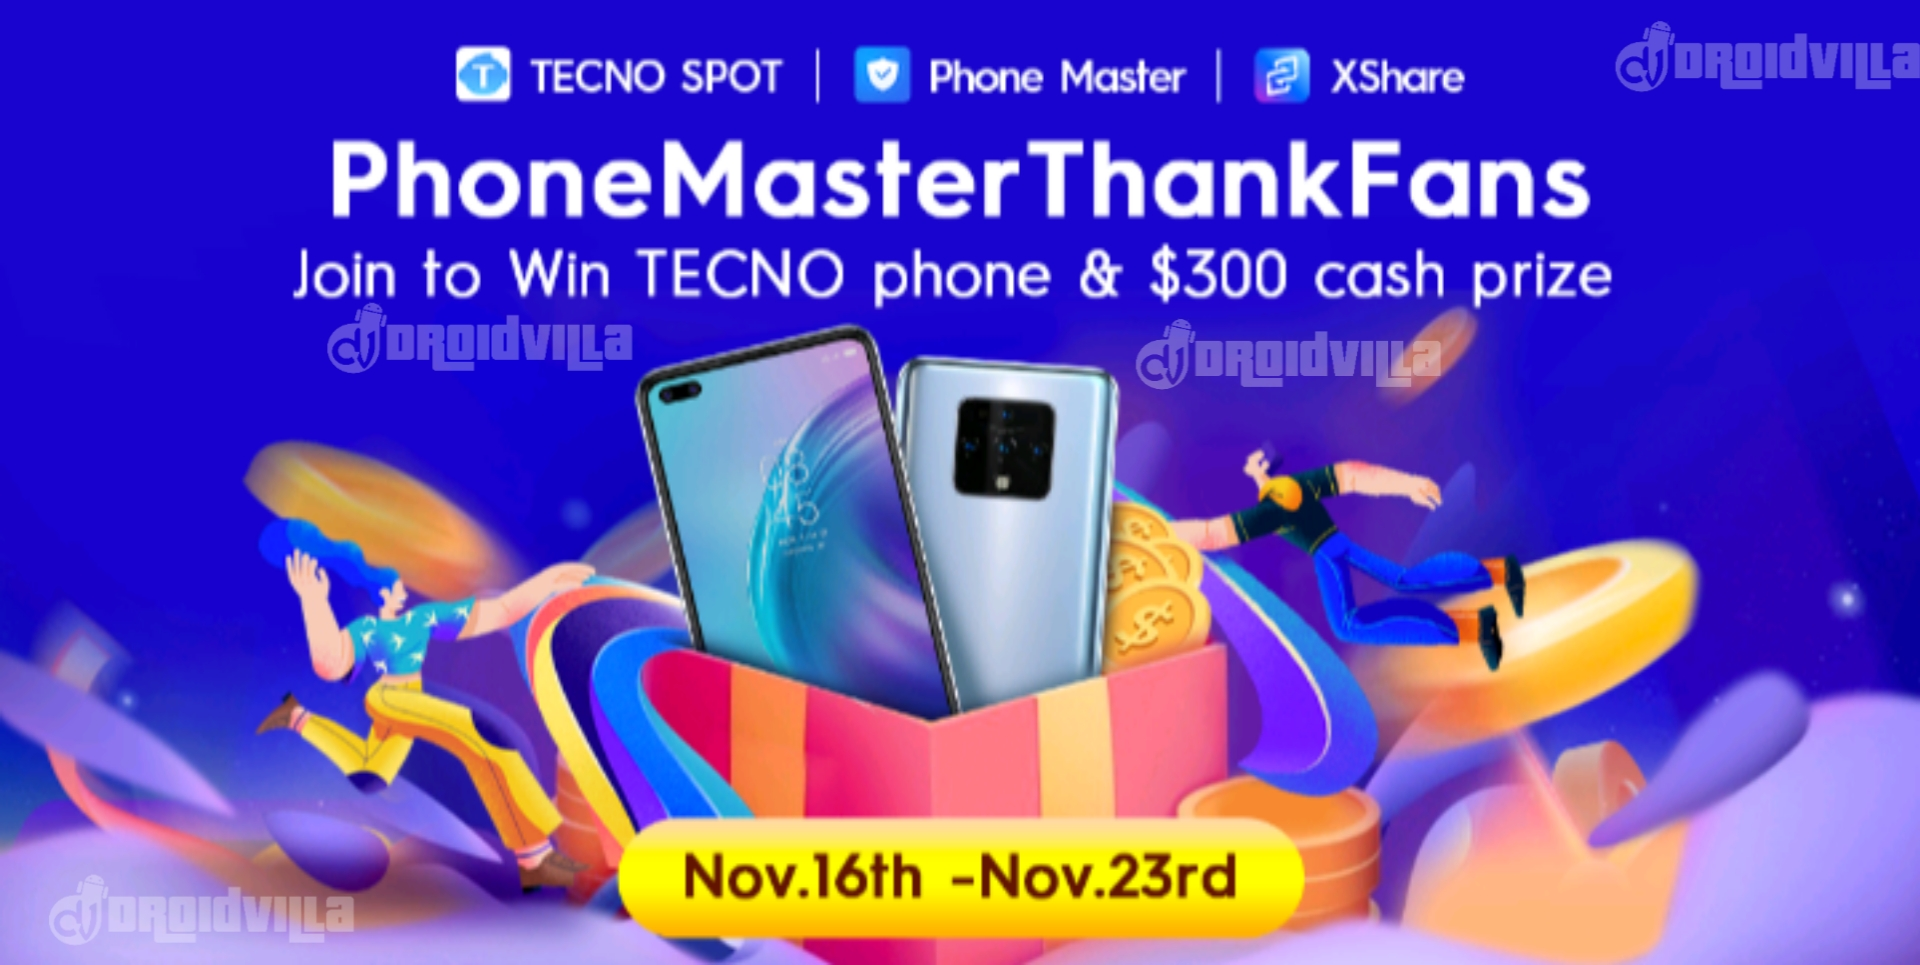 PhoneMasterThankFans free $20